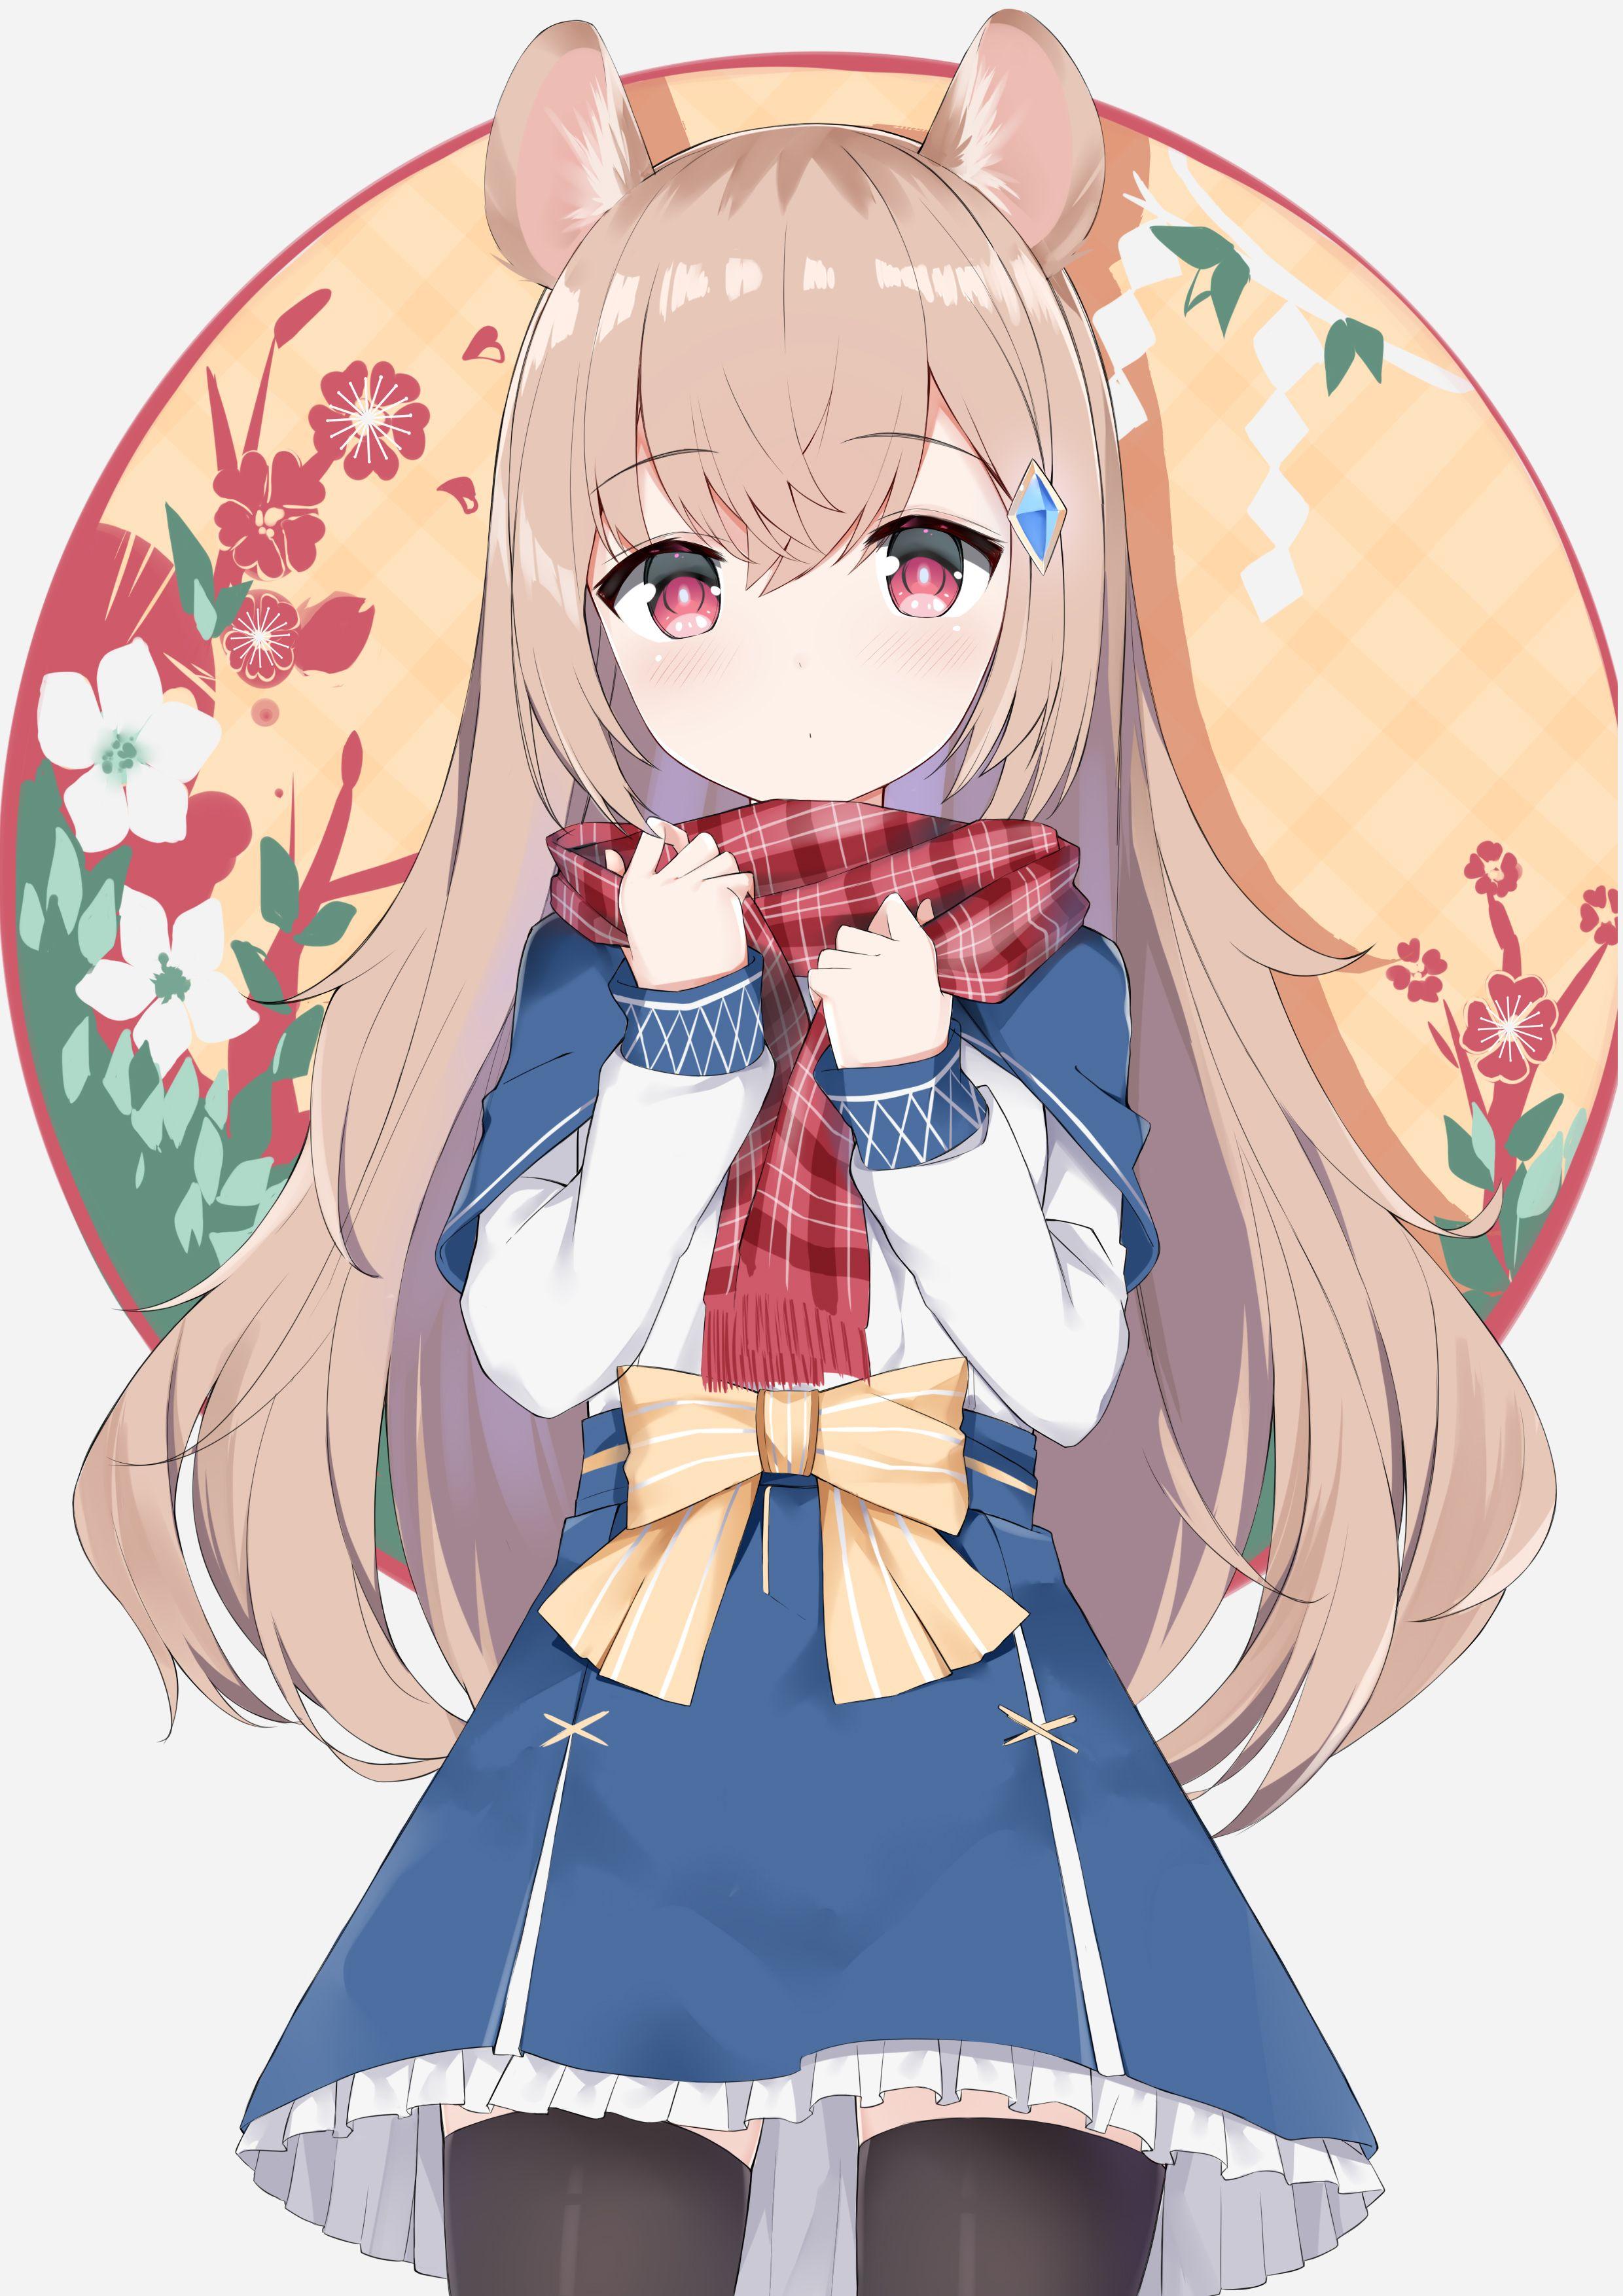 Little Mouse Girl Original In 2020 Cute Neko Girl Anime